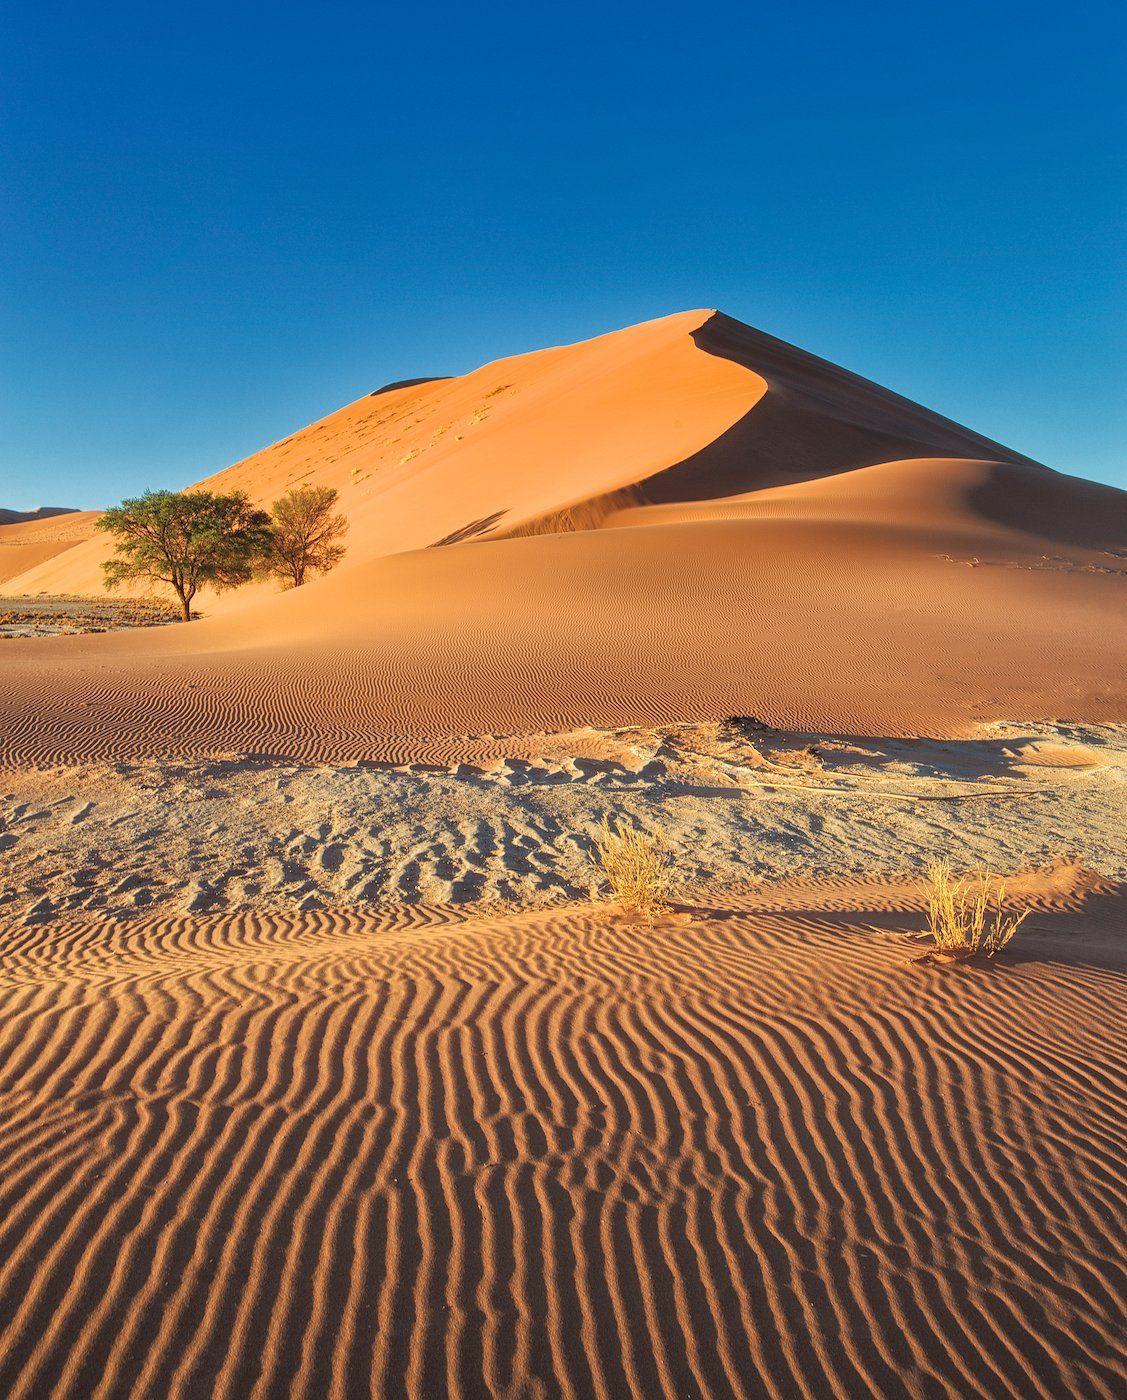 sossusvlei, dunesnamib-naukluft national park, sesriem, namibia, #loveafrica, mc, Маргарита Чернилова